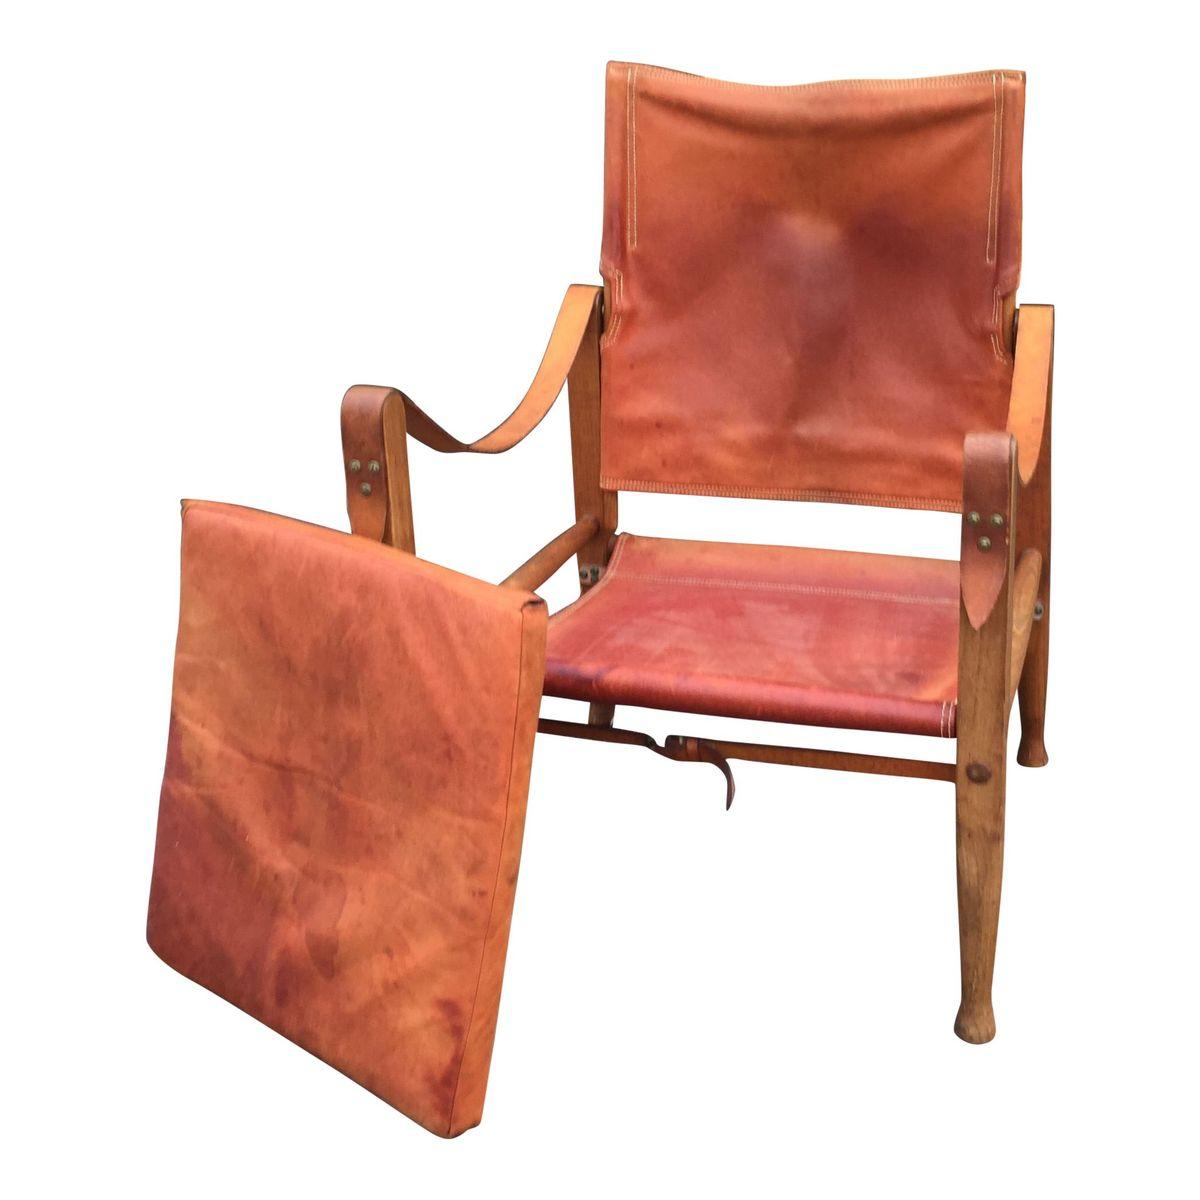 leather safari chair outdoor wicker rocking canada by kaare klint for rud rasmussen